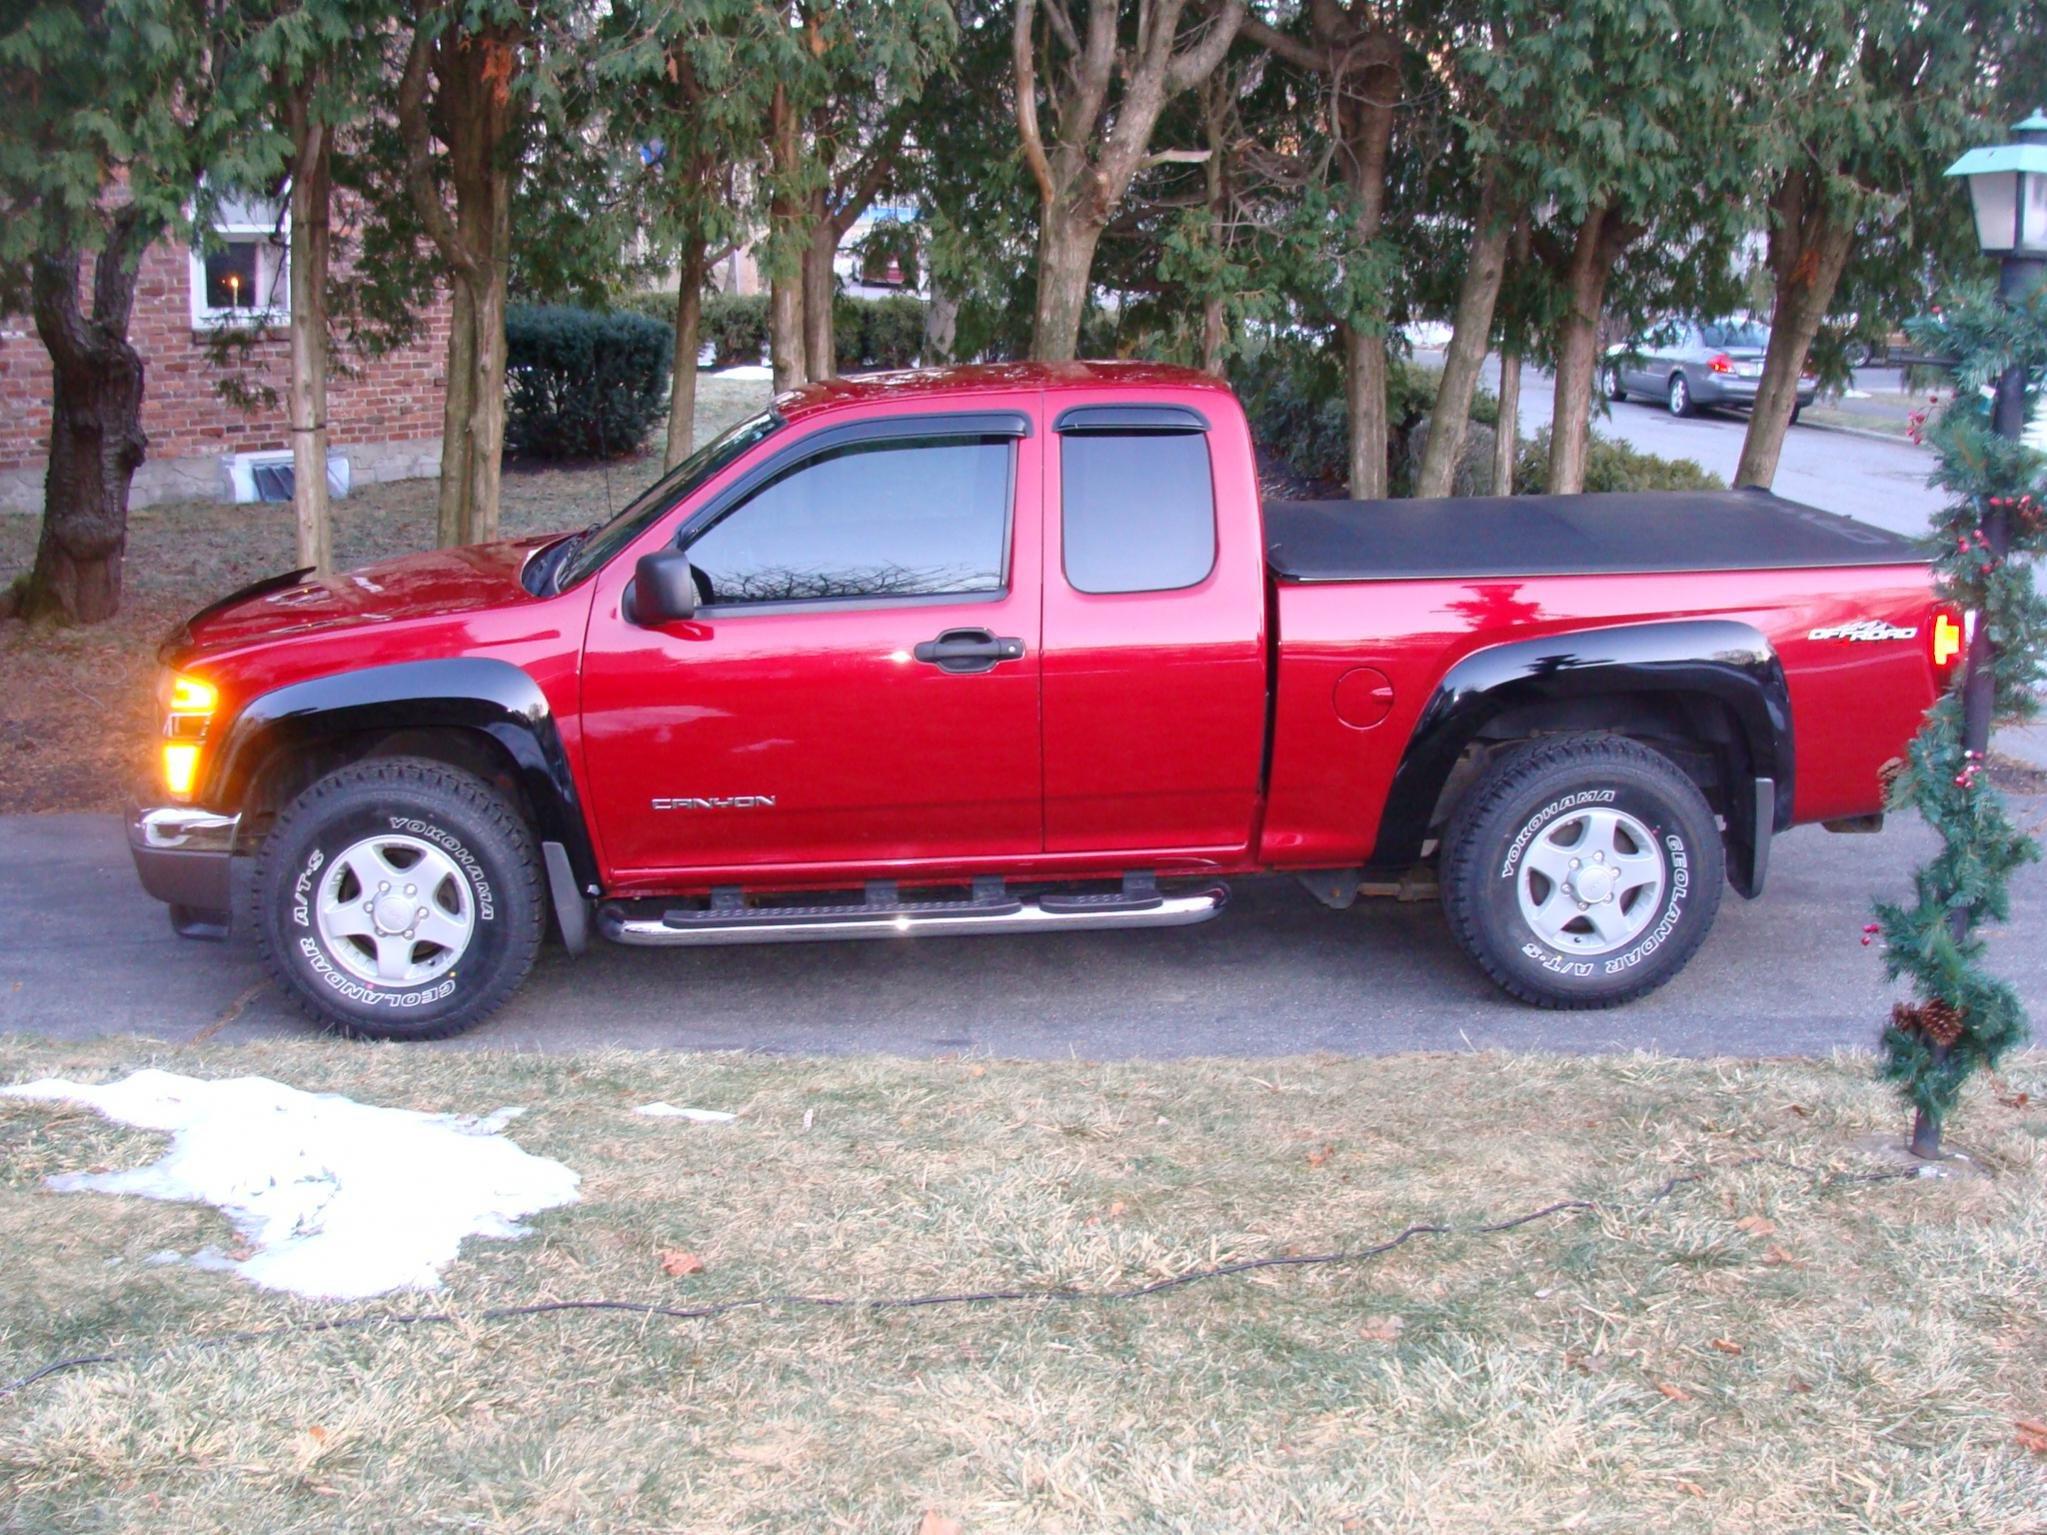 31's on 4x4 z85 wheels, no lift...fits - Chevrolet Colorado & GMC Canyon Forum